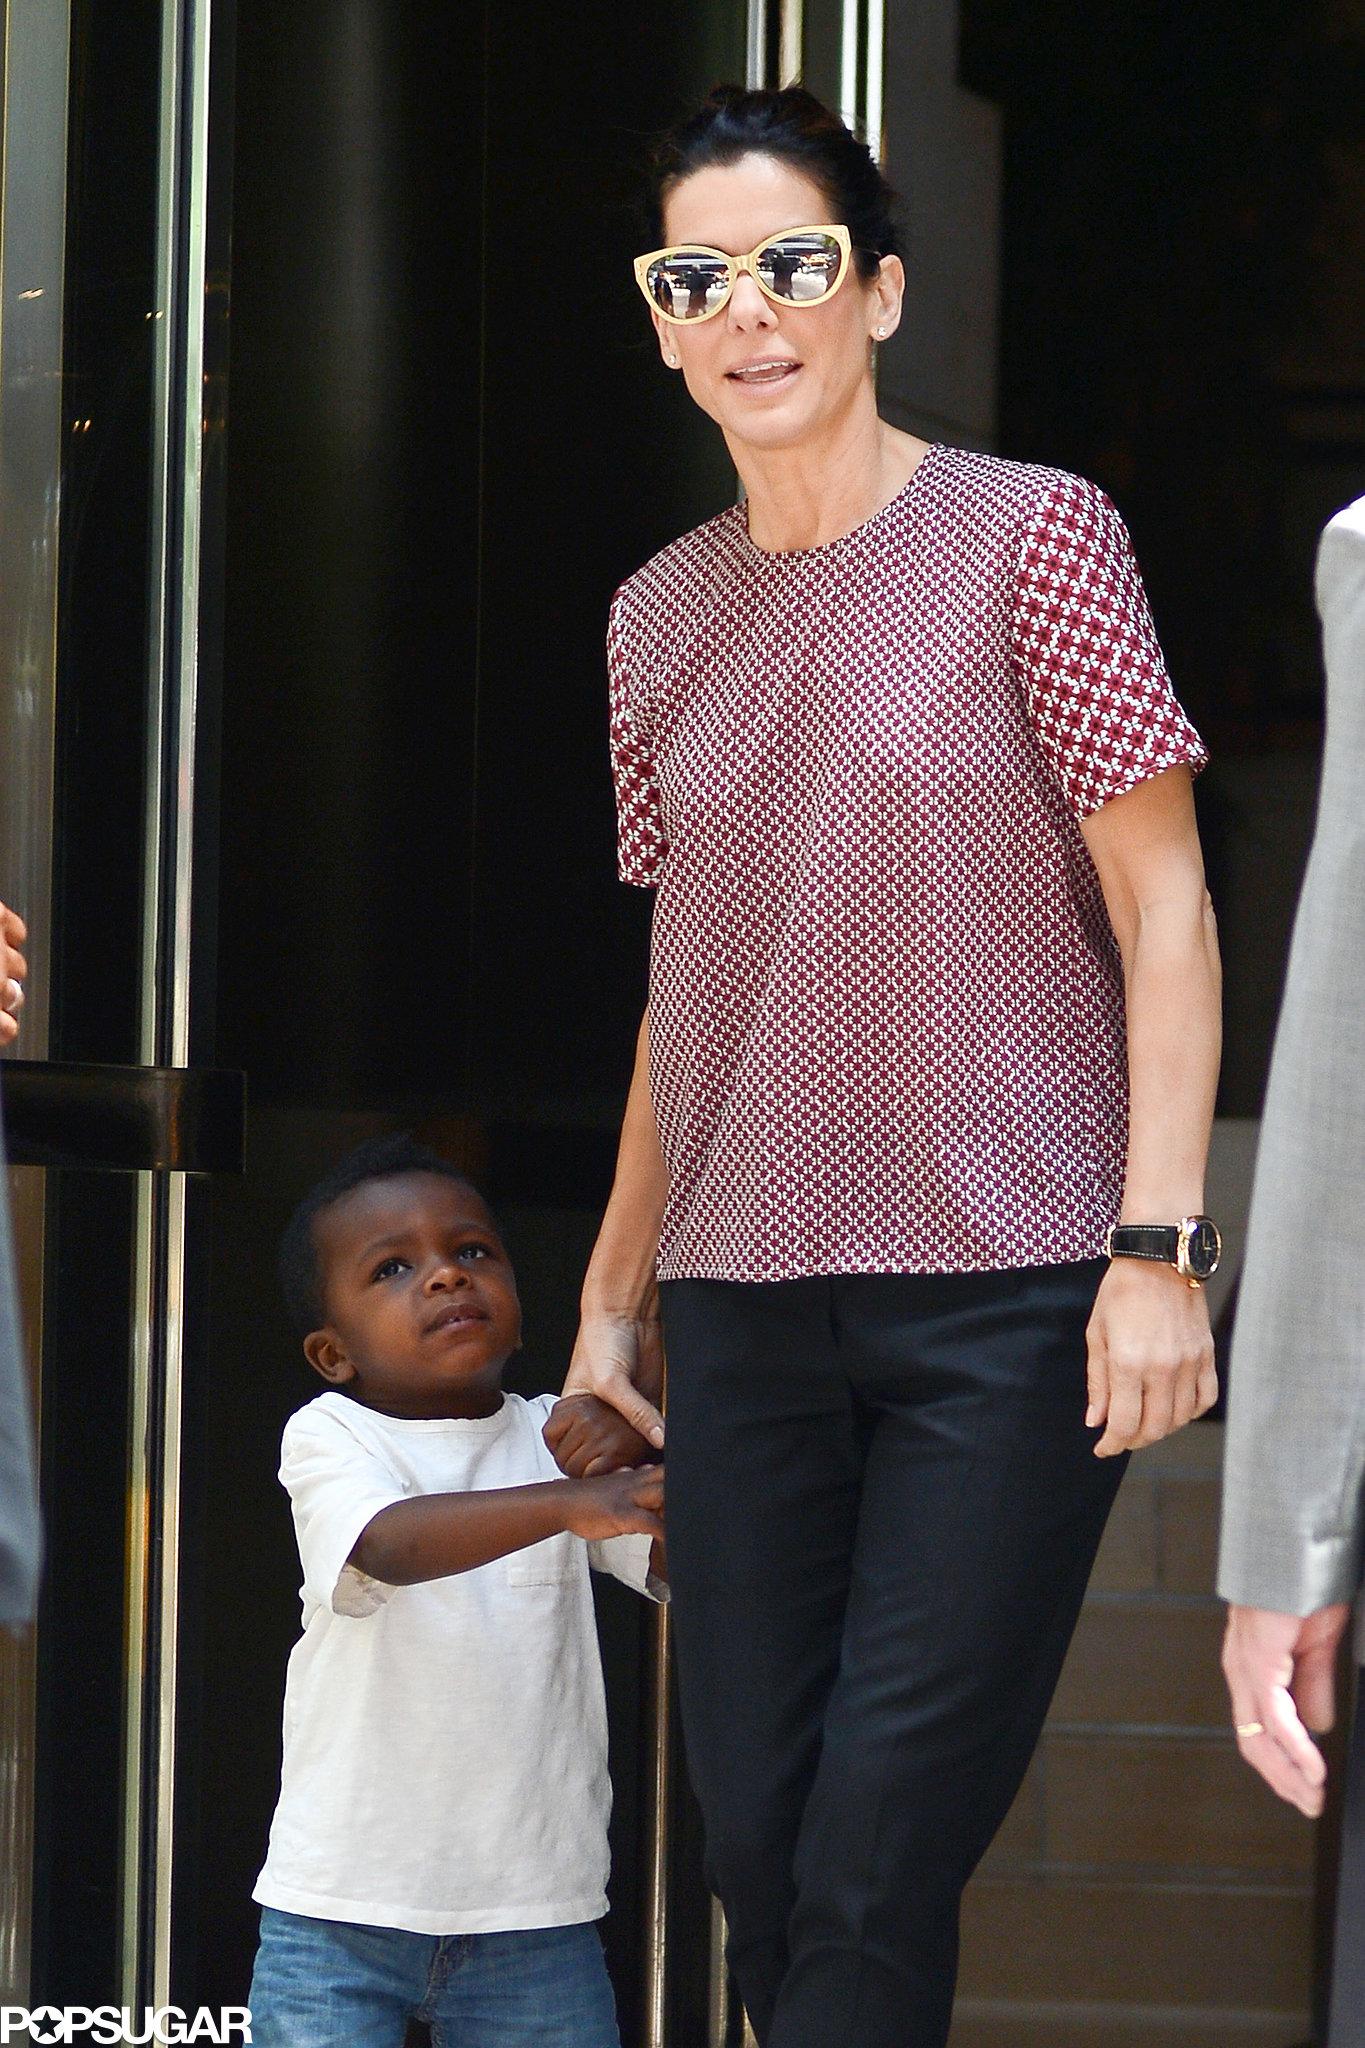 Sandra Bullock Breaks From Press For Lunch With Little Louis